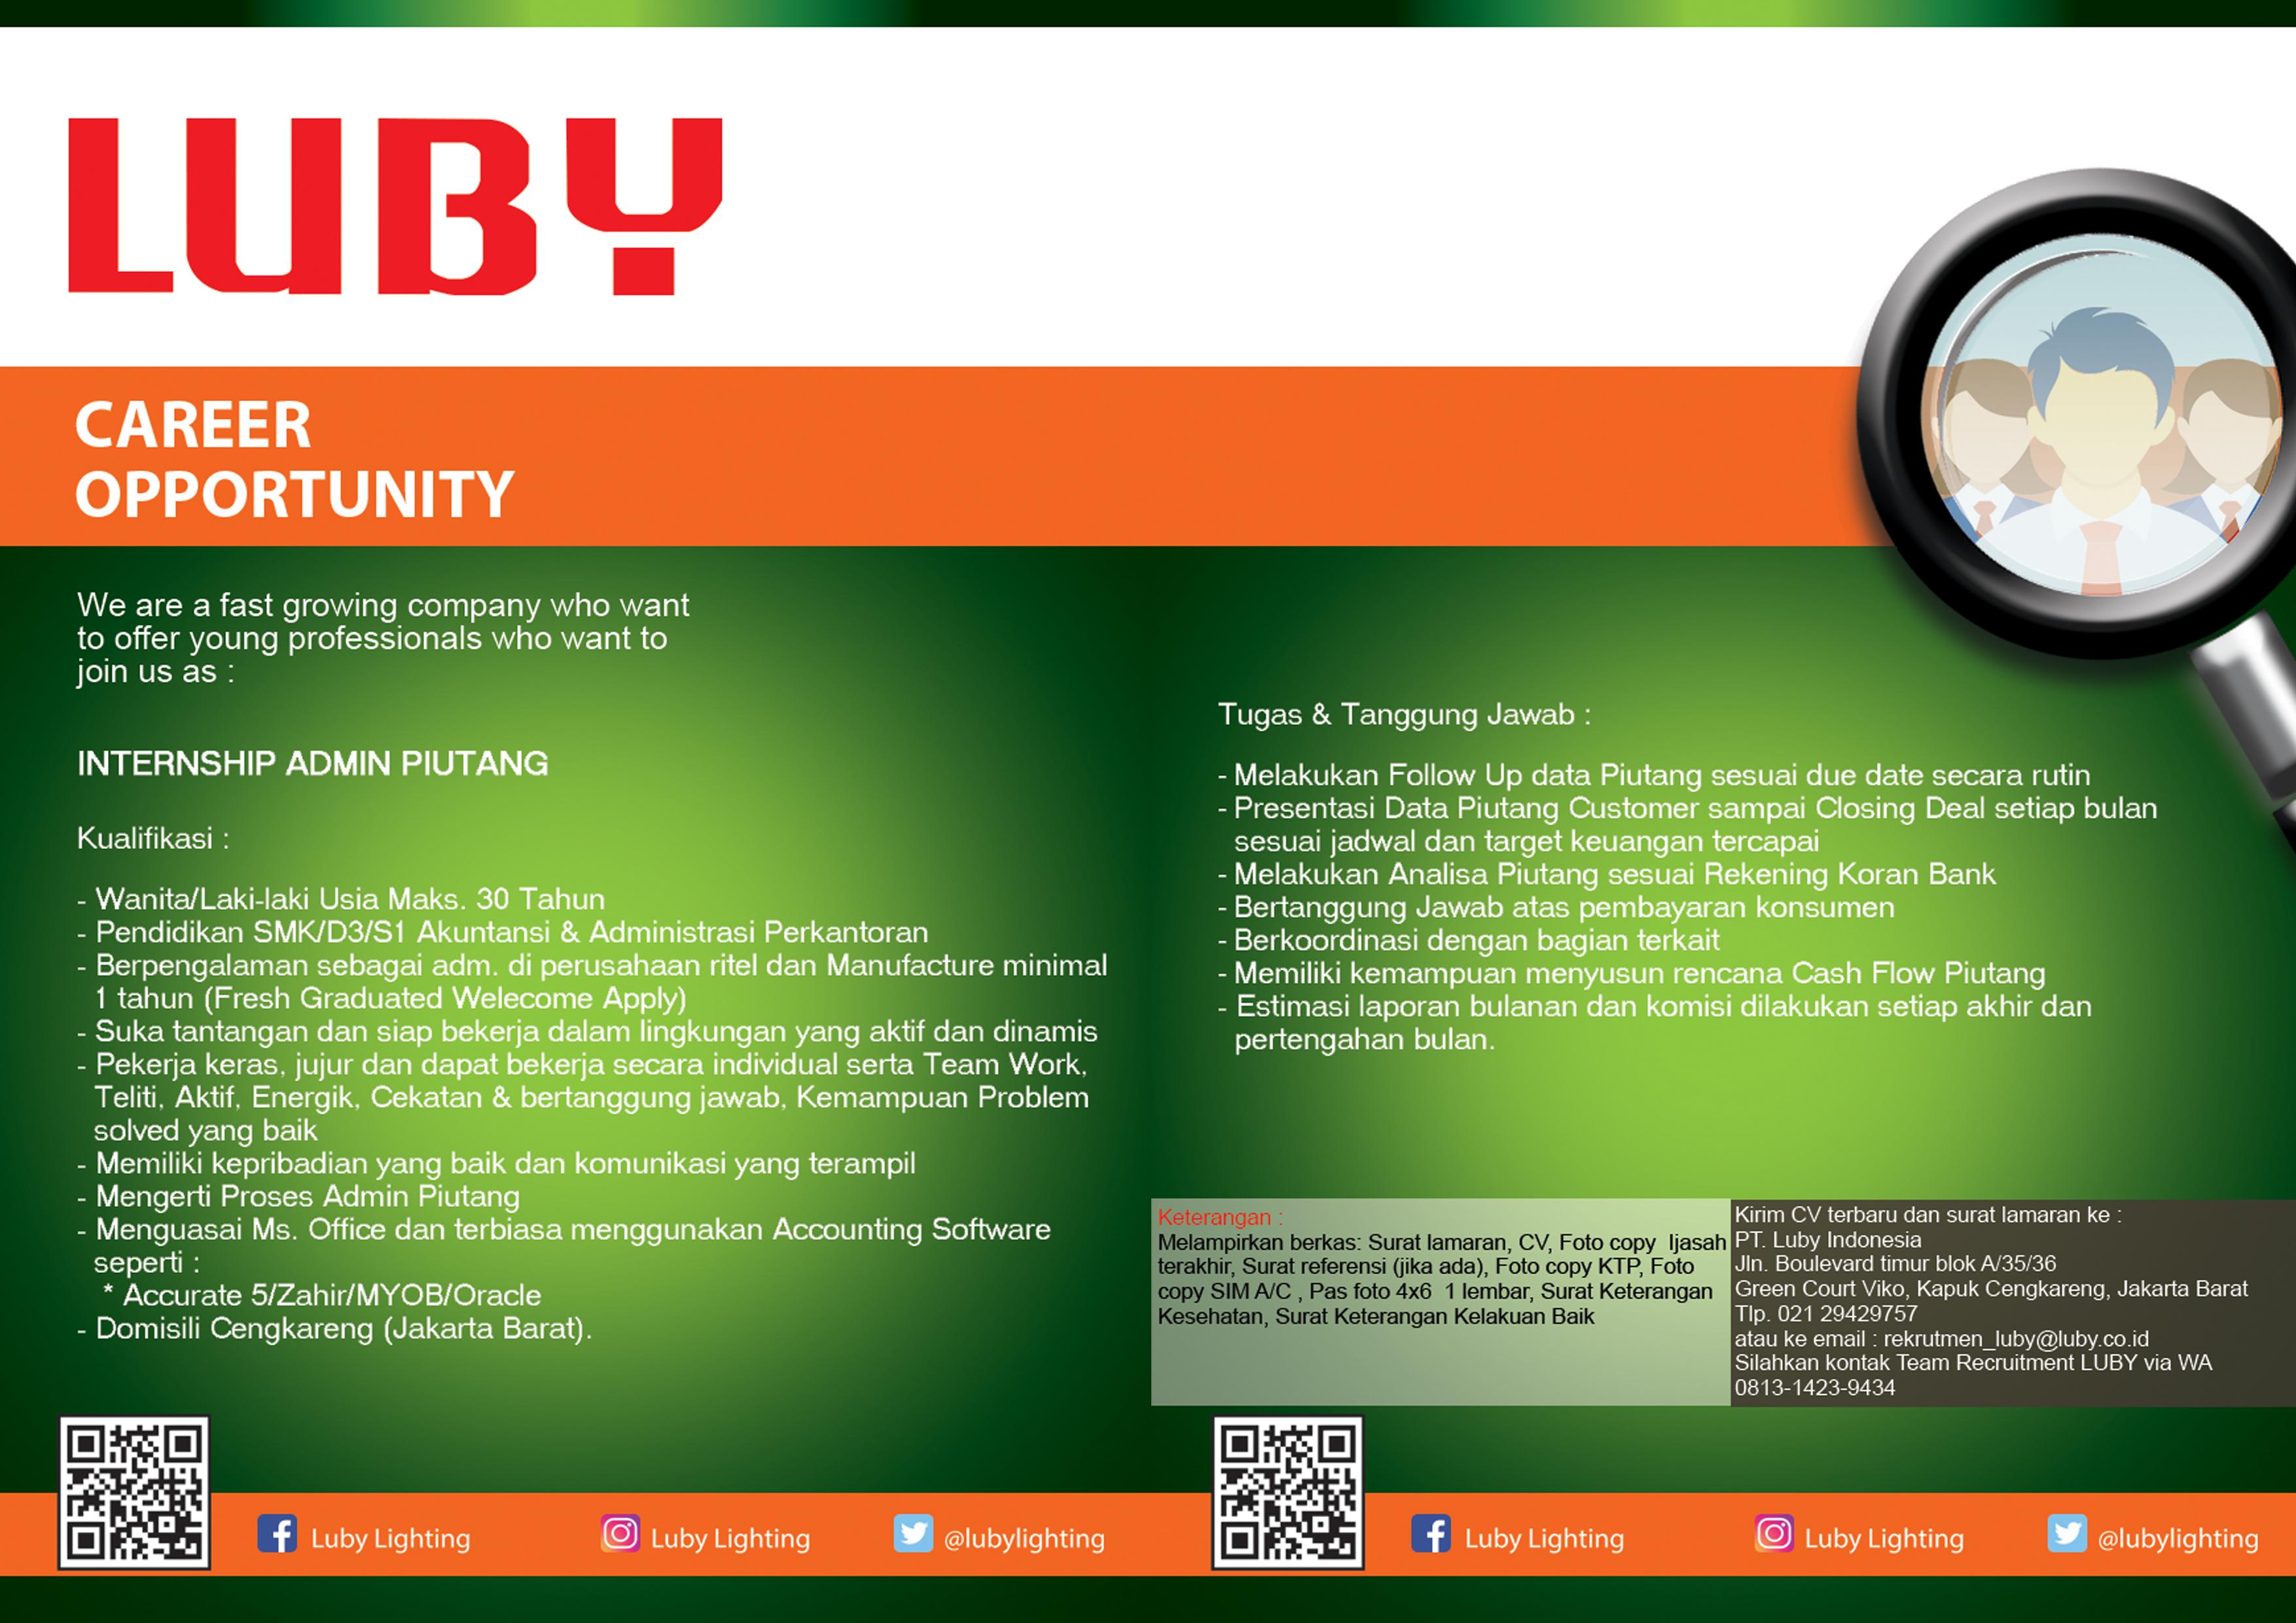 internship-admin-piutang